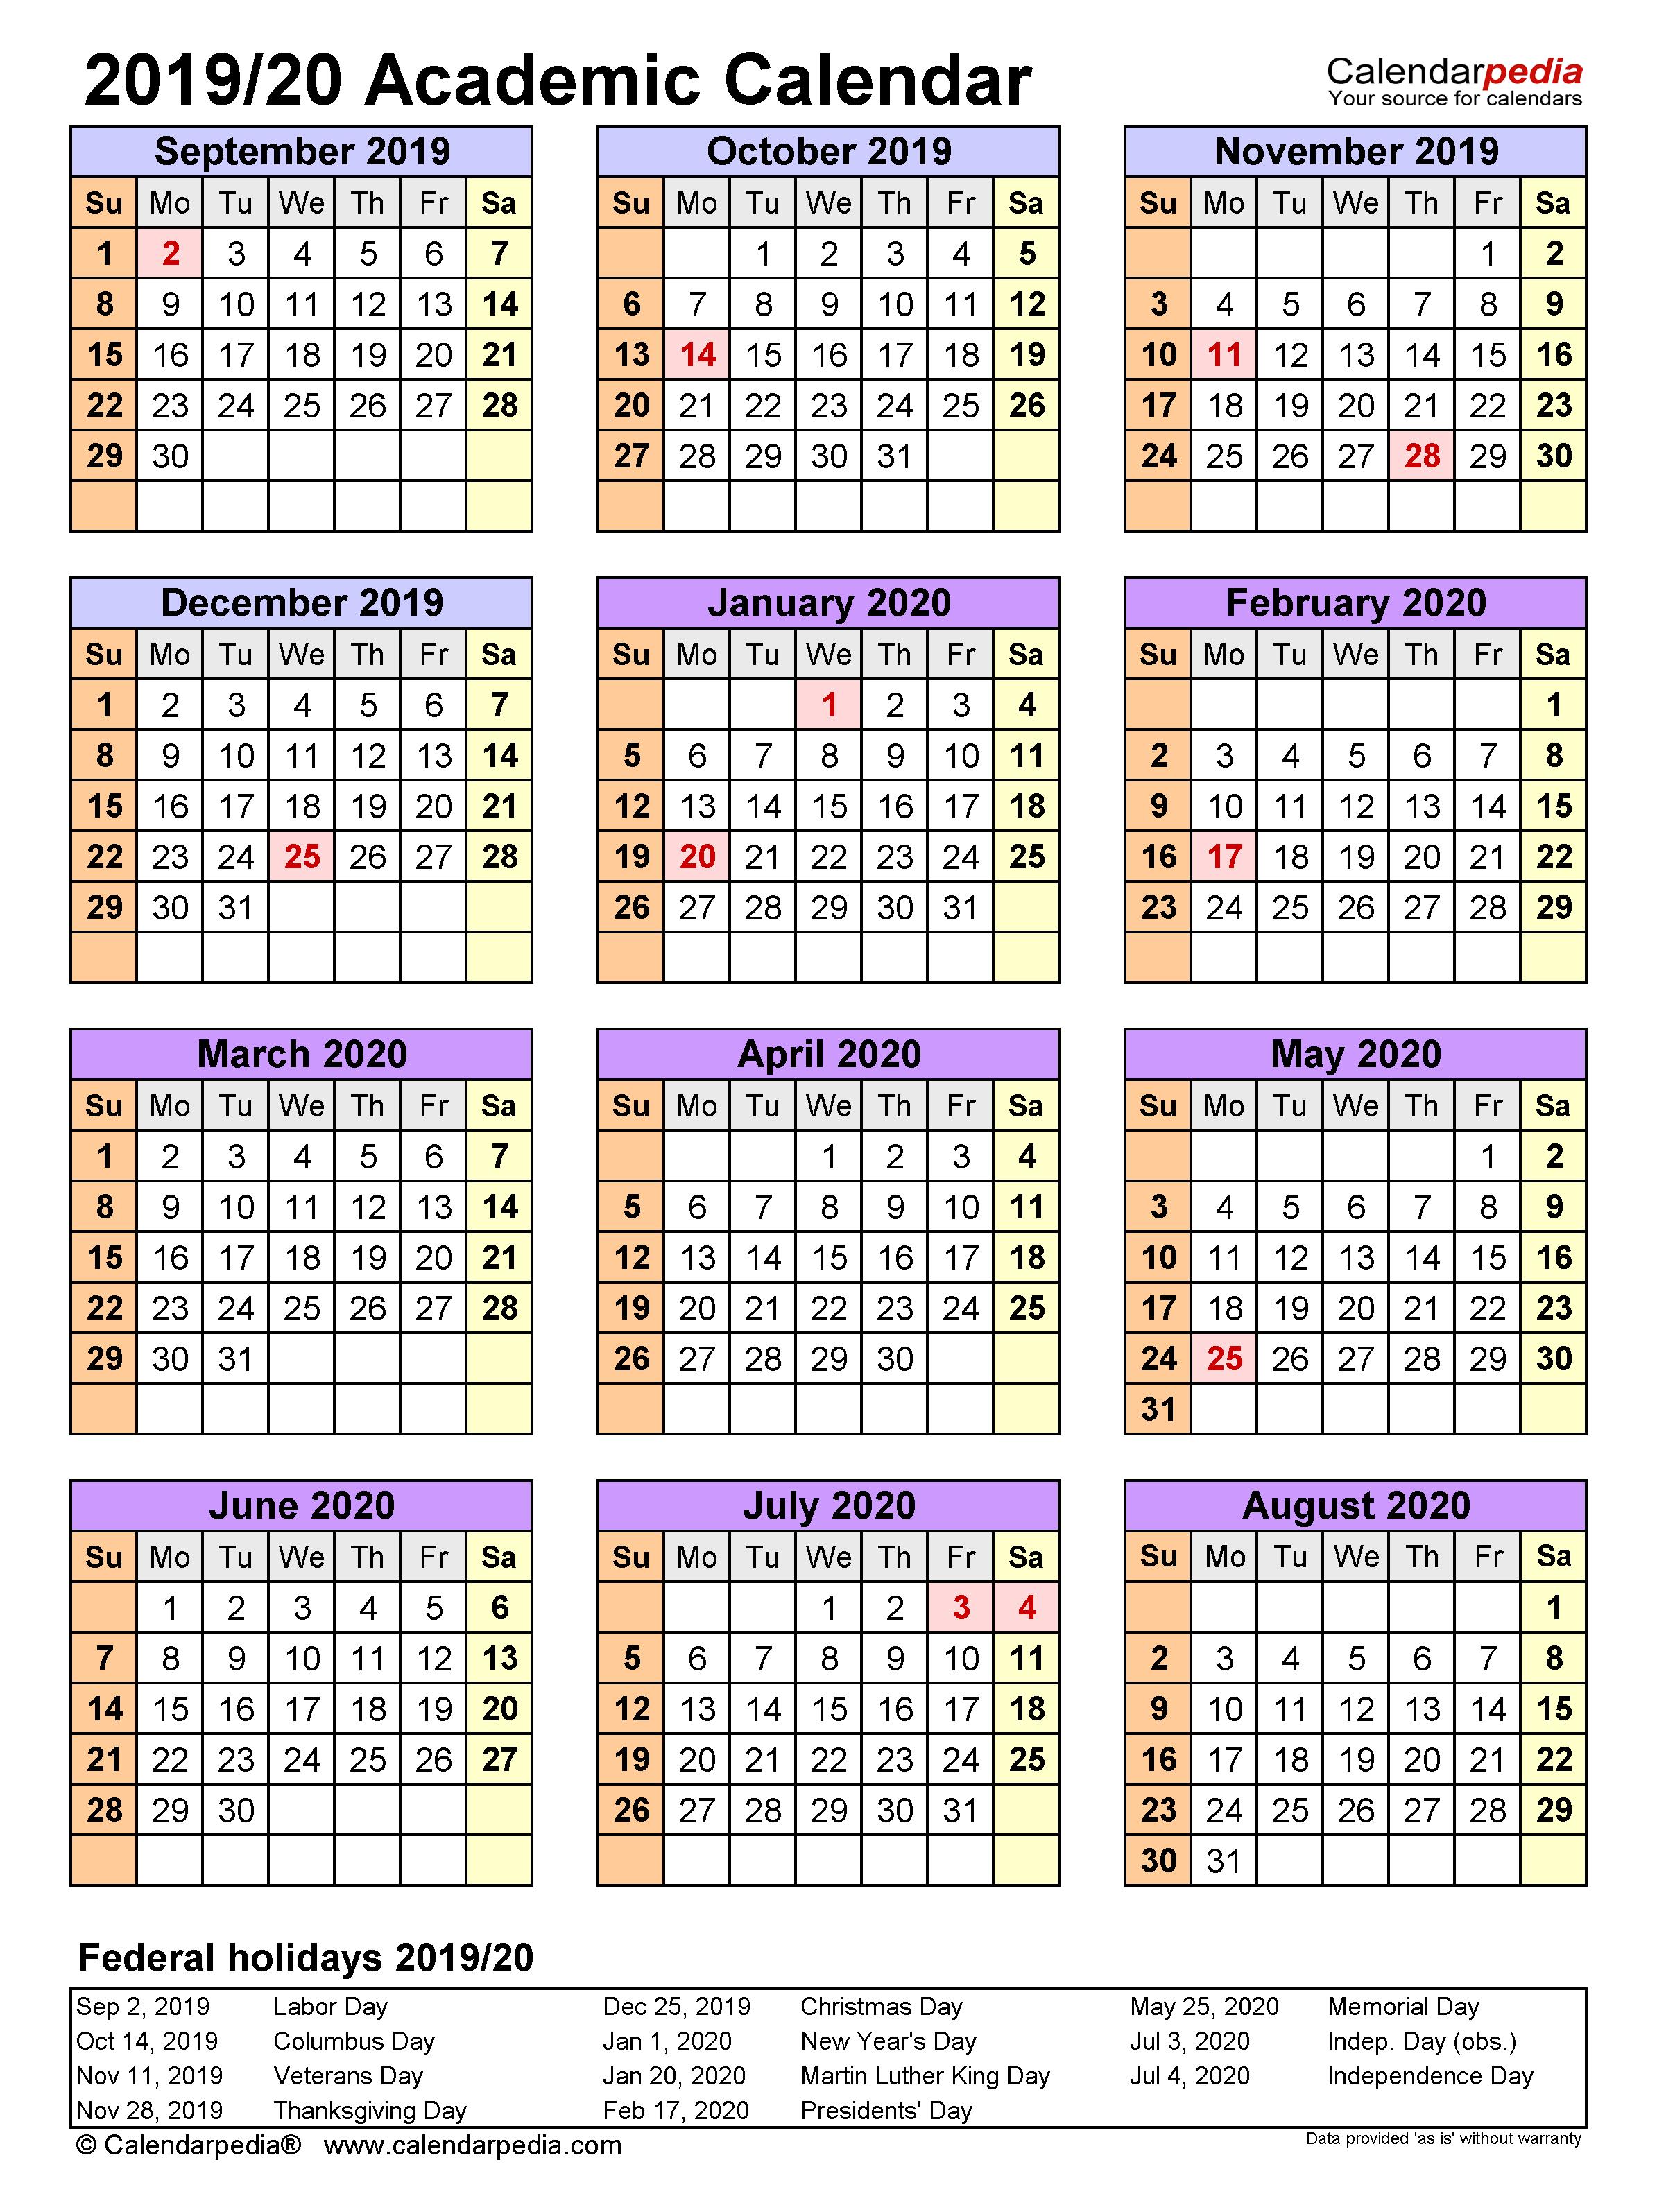 Appalachian State University Calendar 2021 22 | Calendar 2021 With University Of Ri Academic Calendar 2021 2020